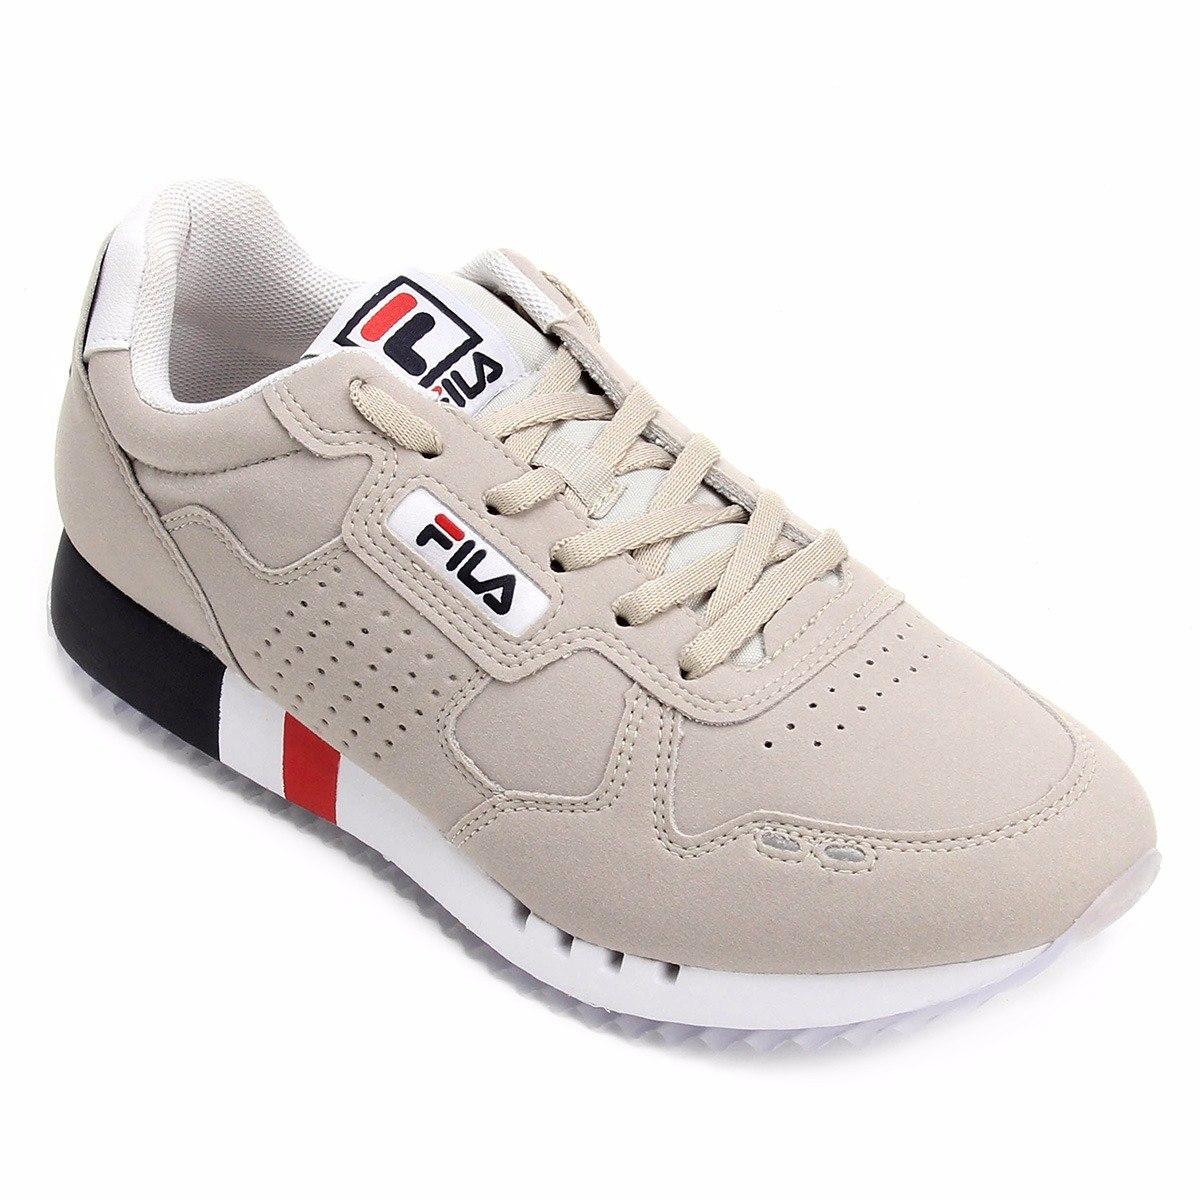 4cfa64364c0 Tênis Fila Masculino Classic 92 Casual Passeio Treino Top - R  288 ...